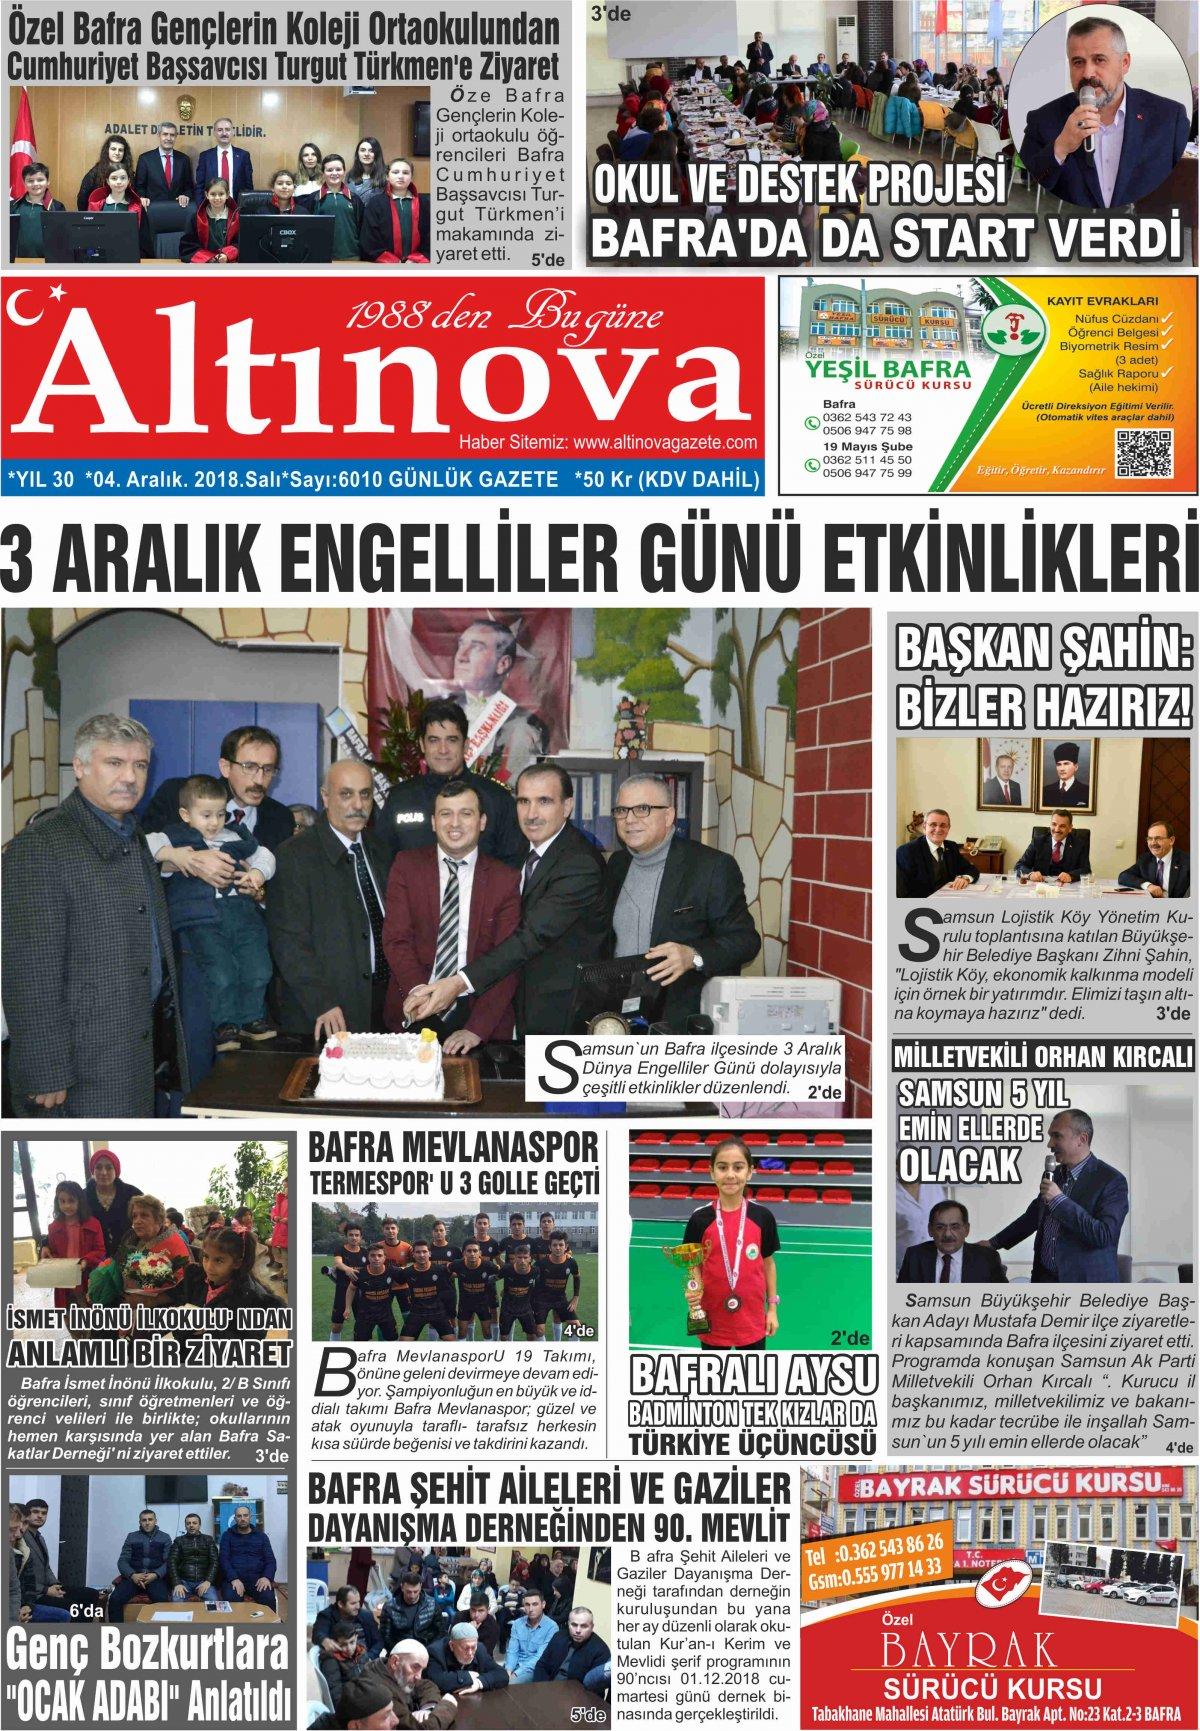 Bafra Haberleri | Bafra Haber – Bafra Son Dakika Haber - 04.12.2018 Manşeti